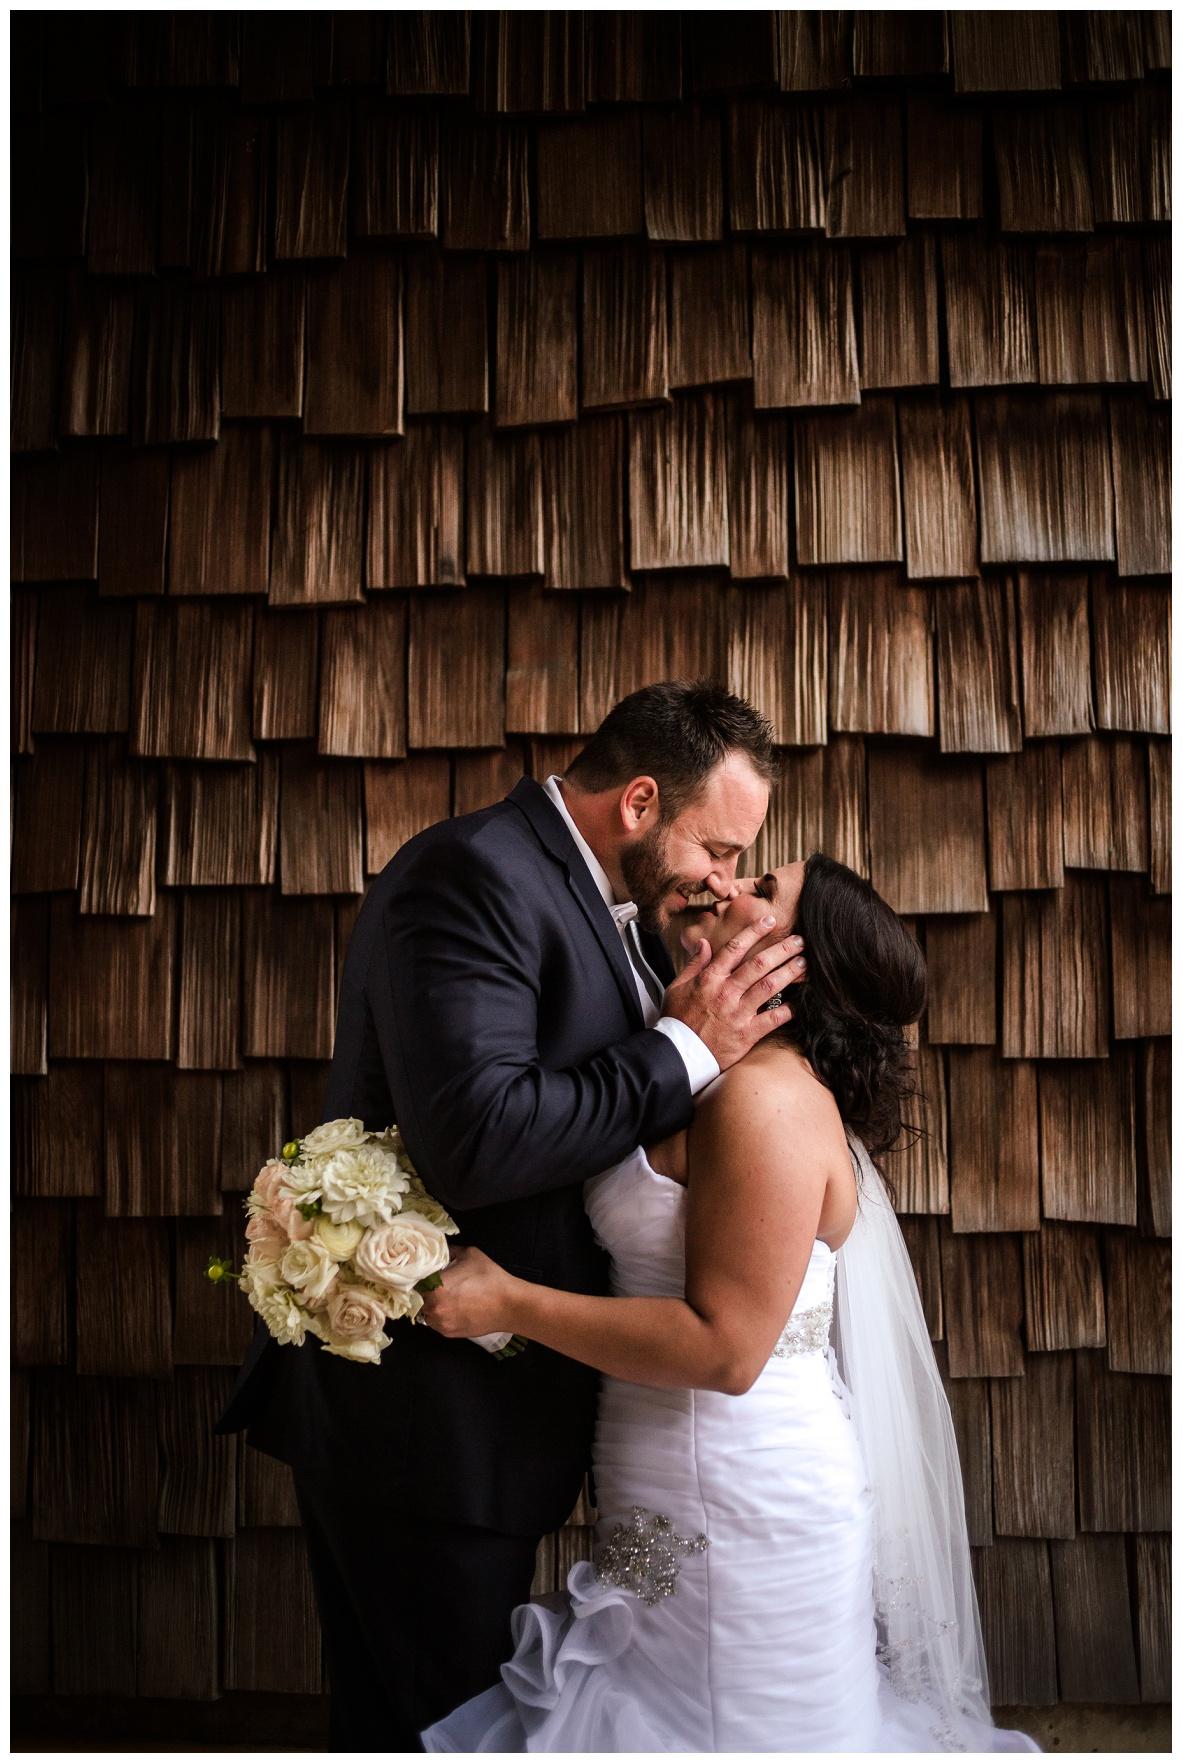 Mr. and Mrs. Hornyak_0074m (6).jpg